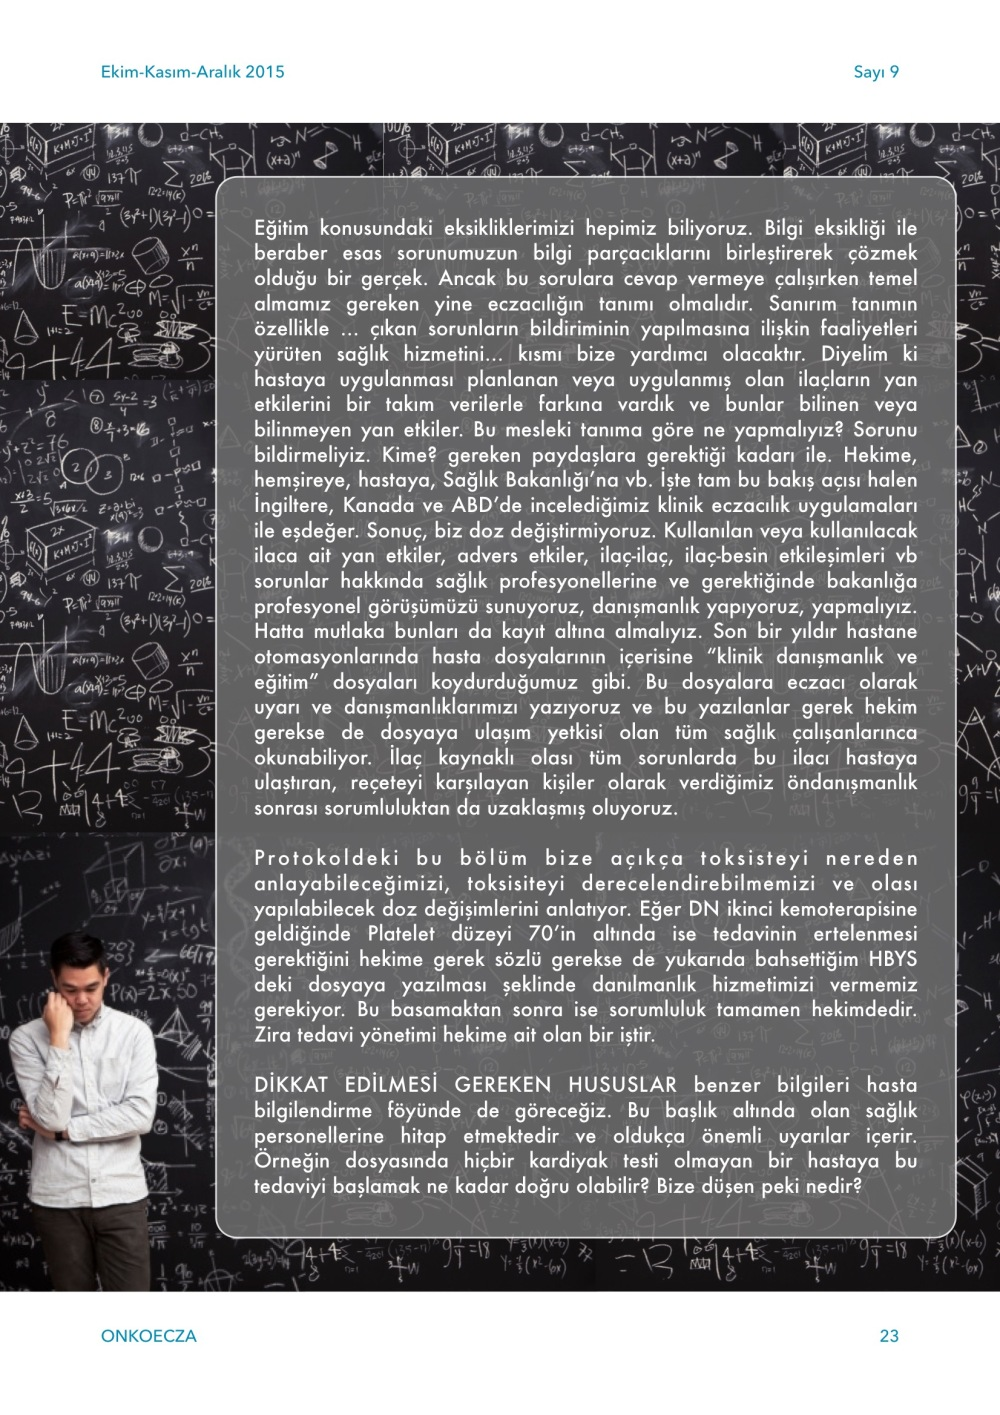 ONKOECZADERGIsayı9 23-23